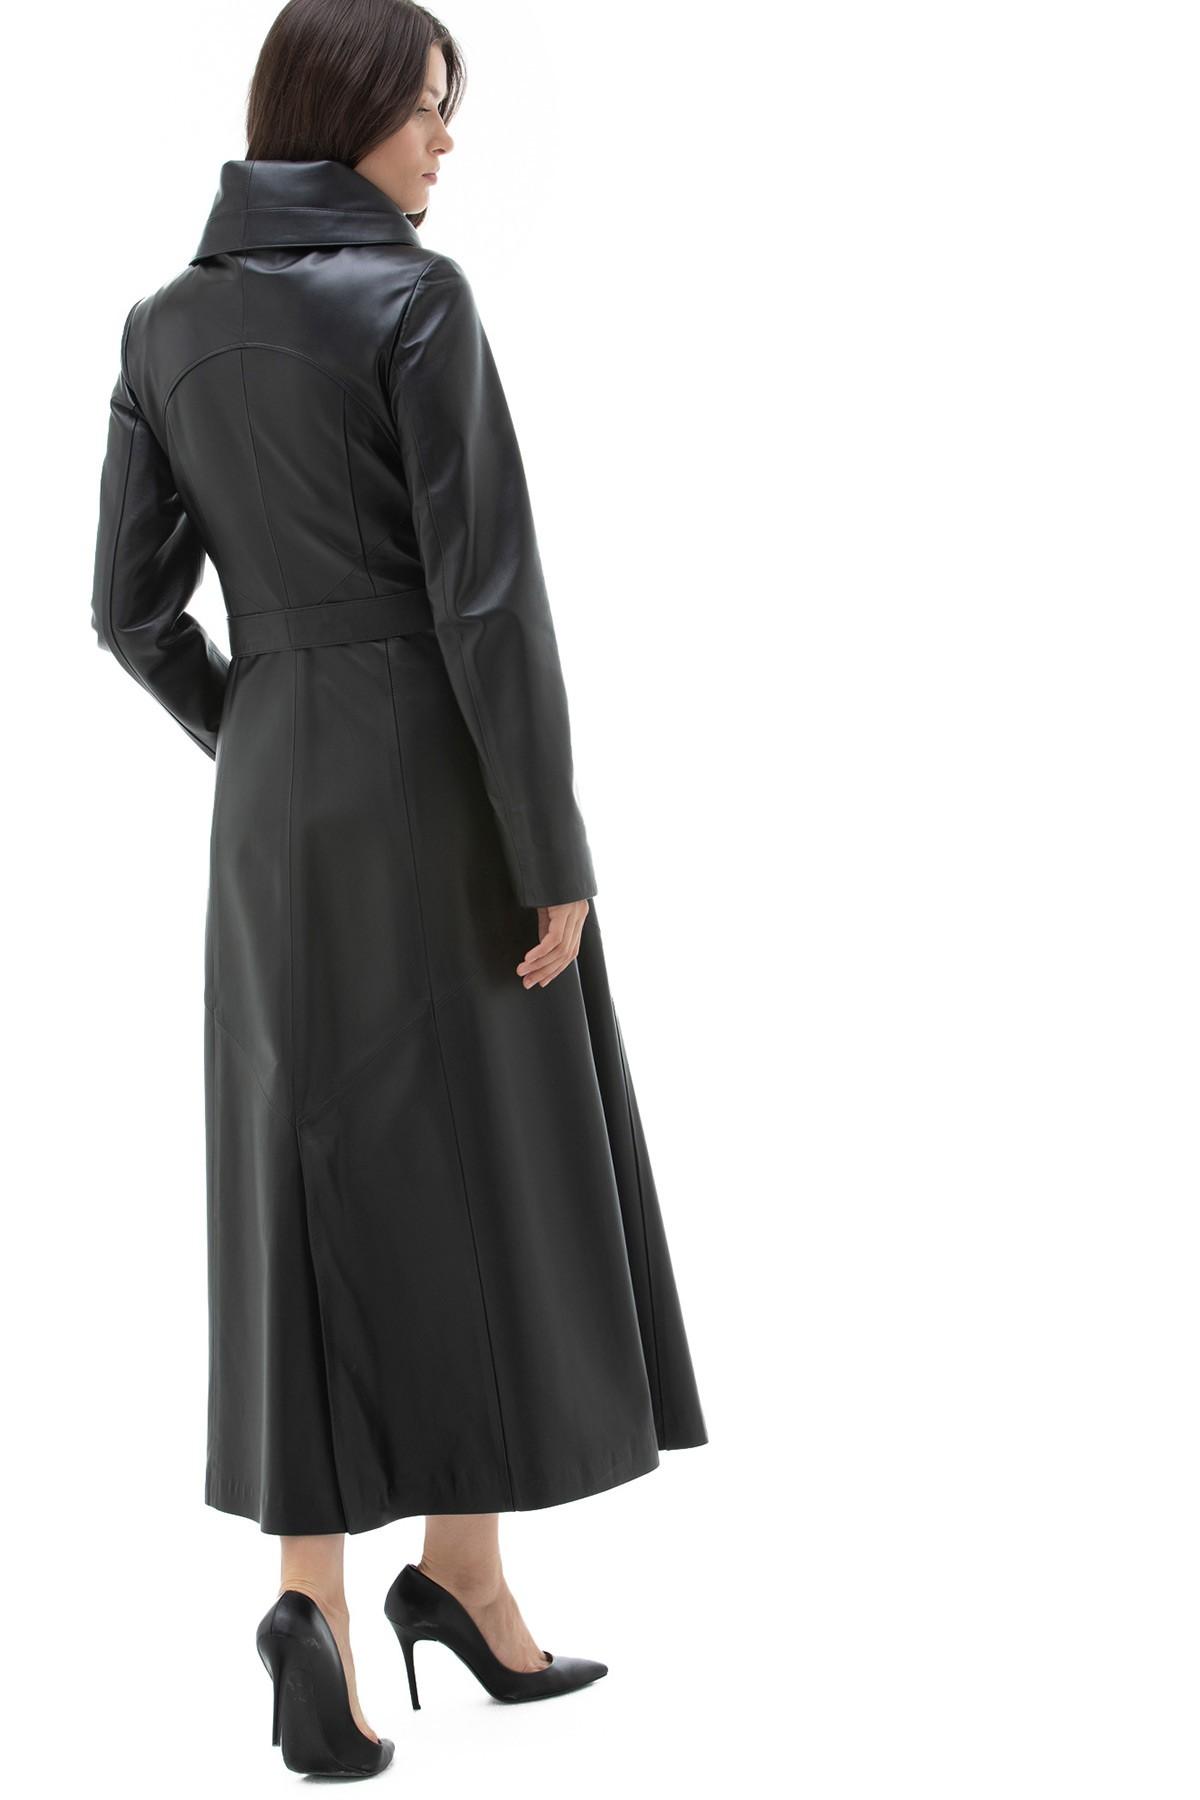 Womens Black Leather Coat